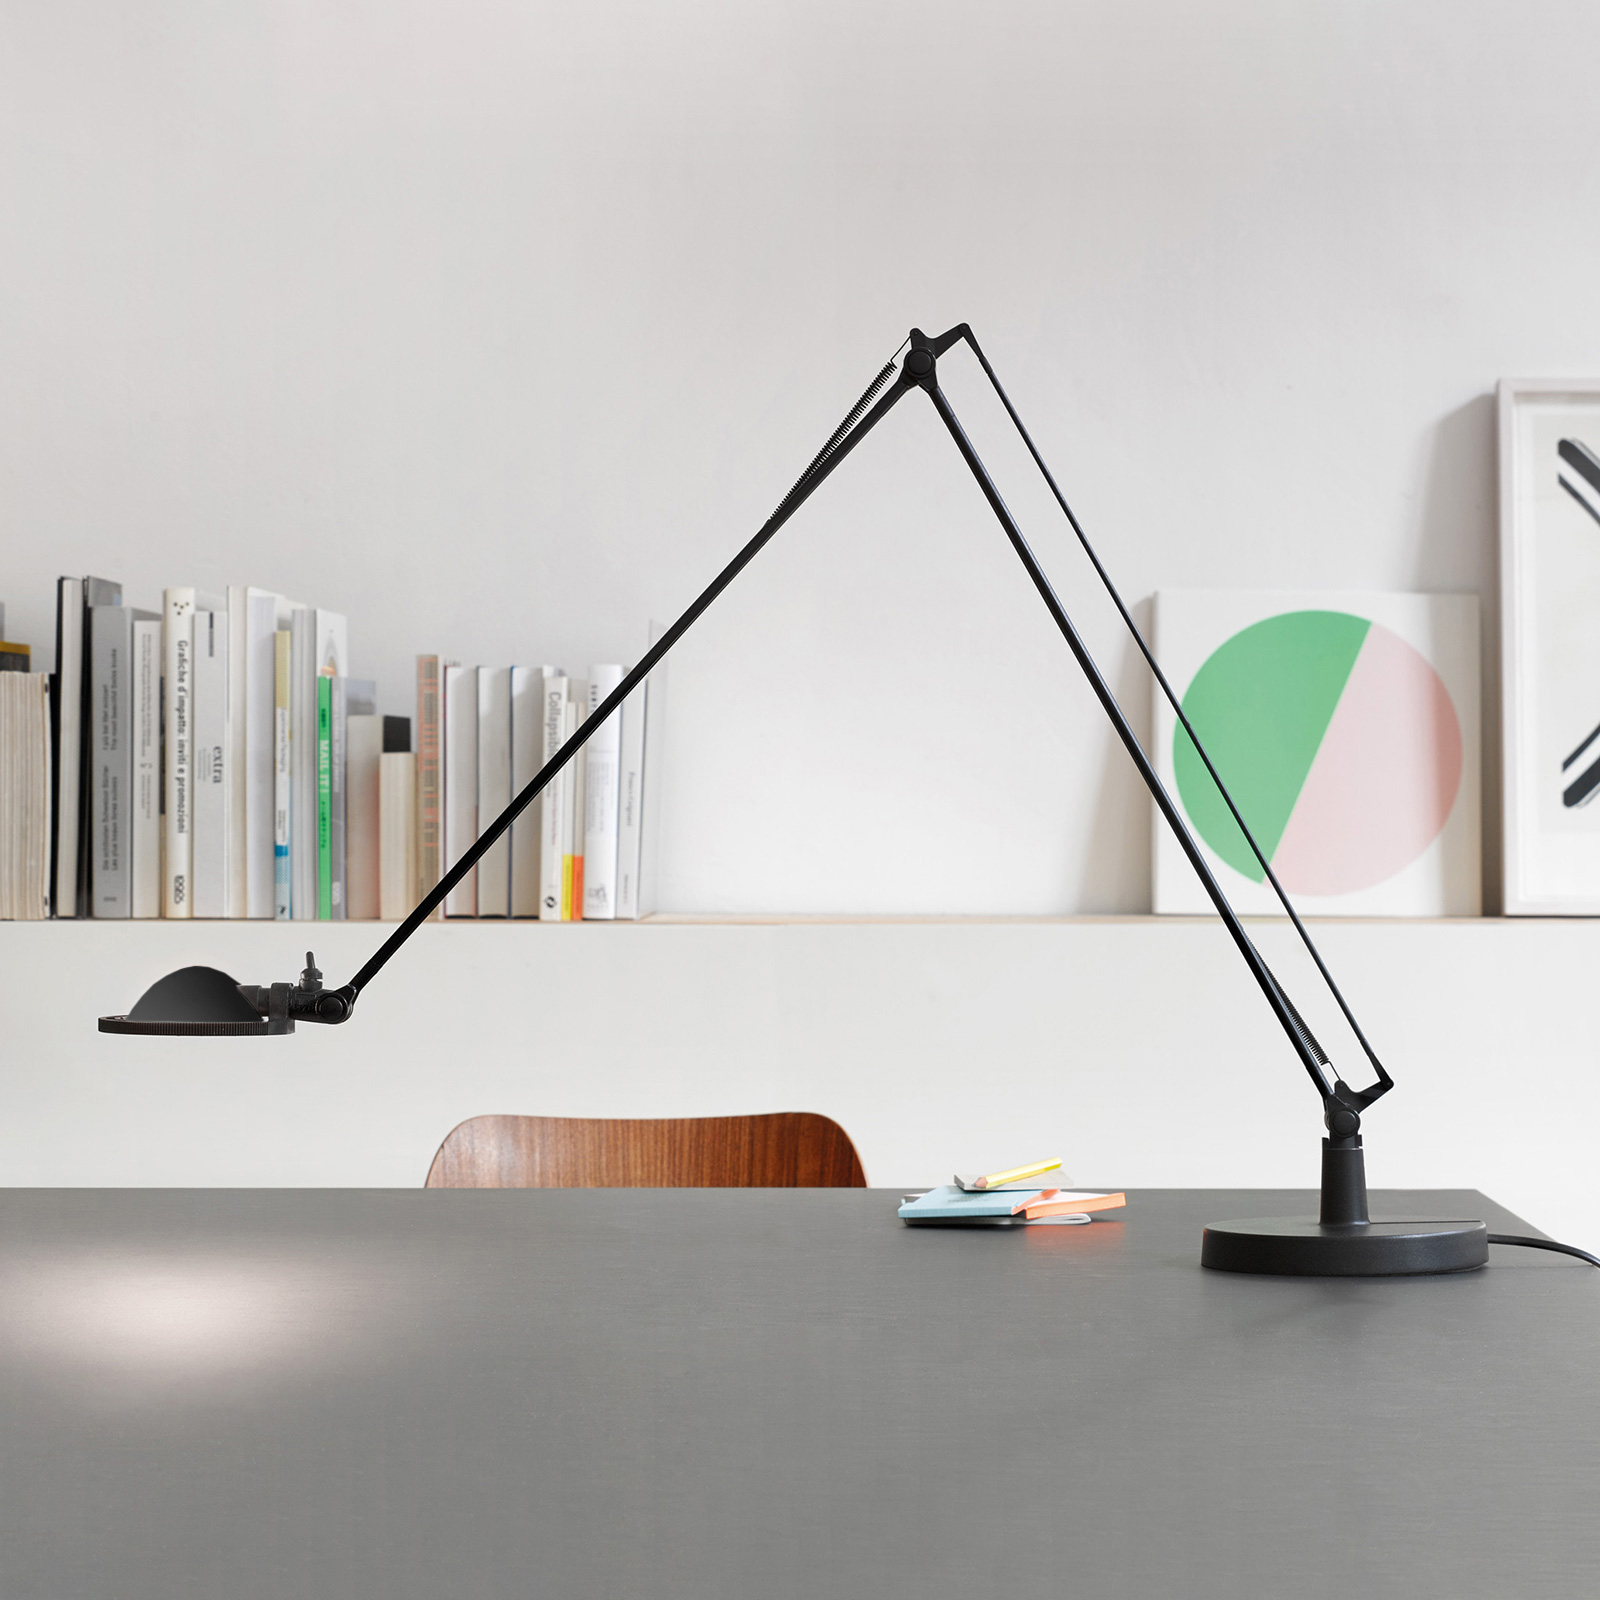 Luceplan Berenice 15 cm, musta, metalliheijastin